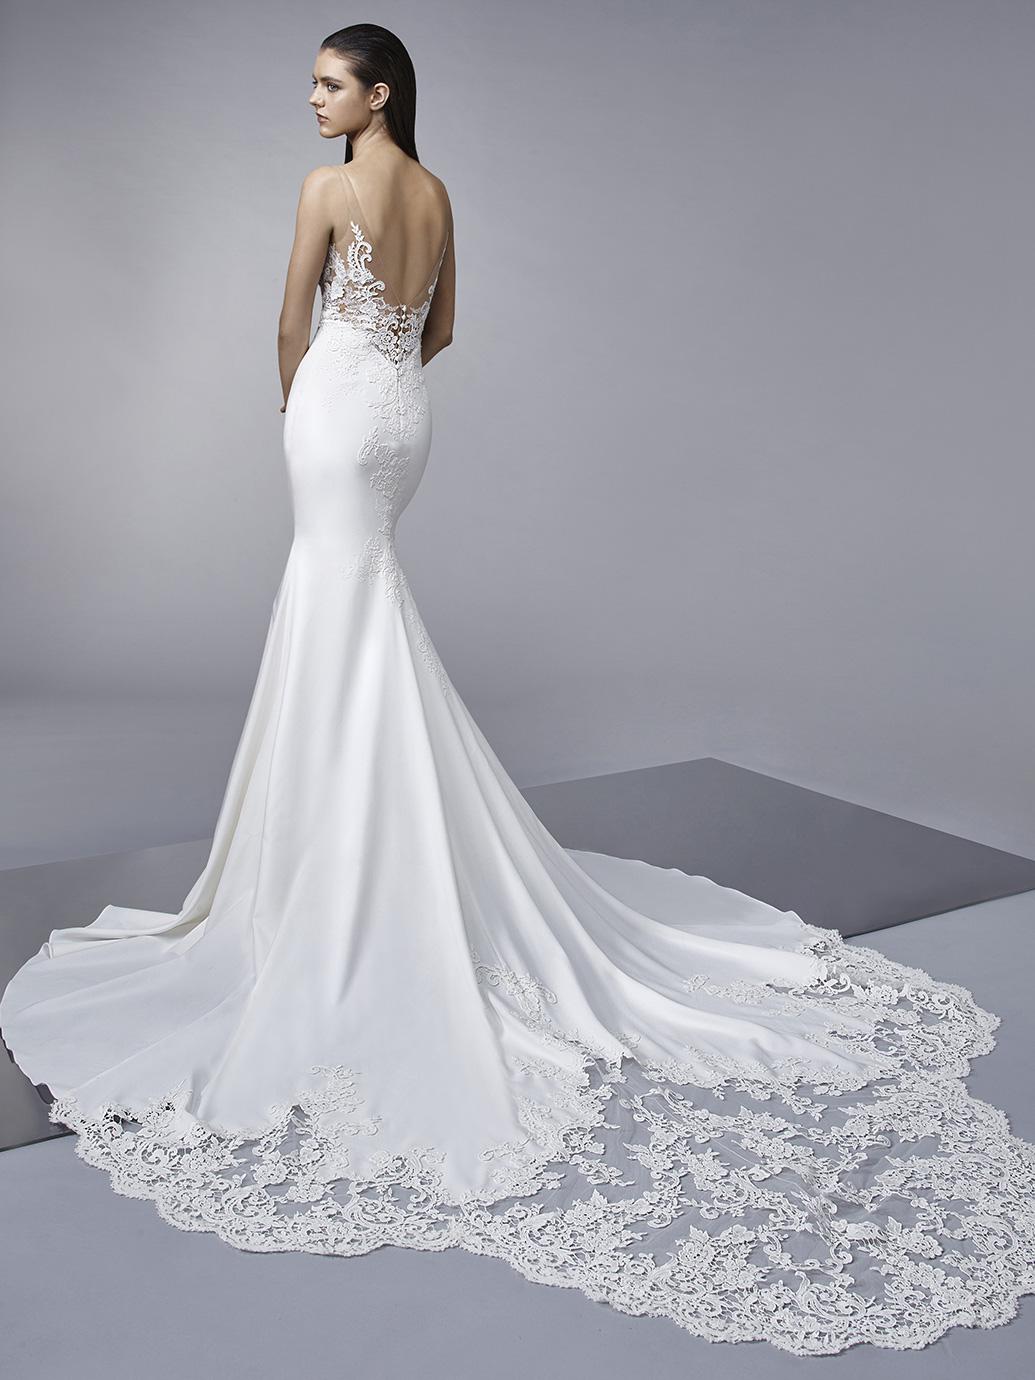 Enzoani_Wedding Gown2018_Pro_Margo_Bac_Web crepe wedding dress light wedding dress